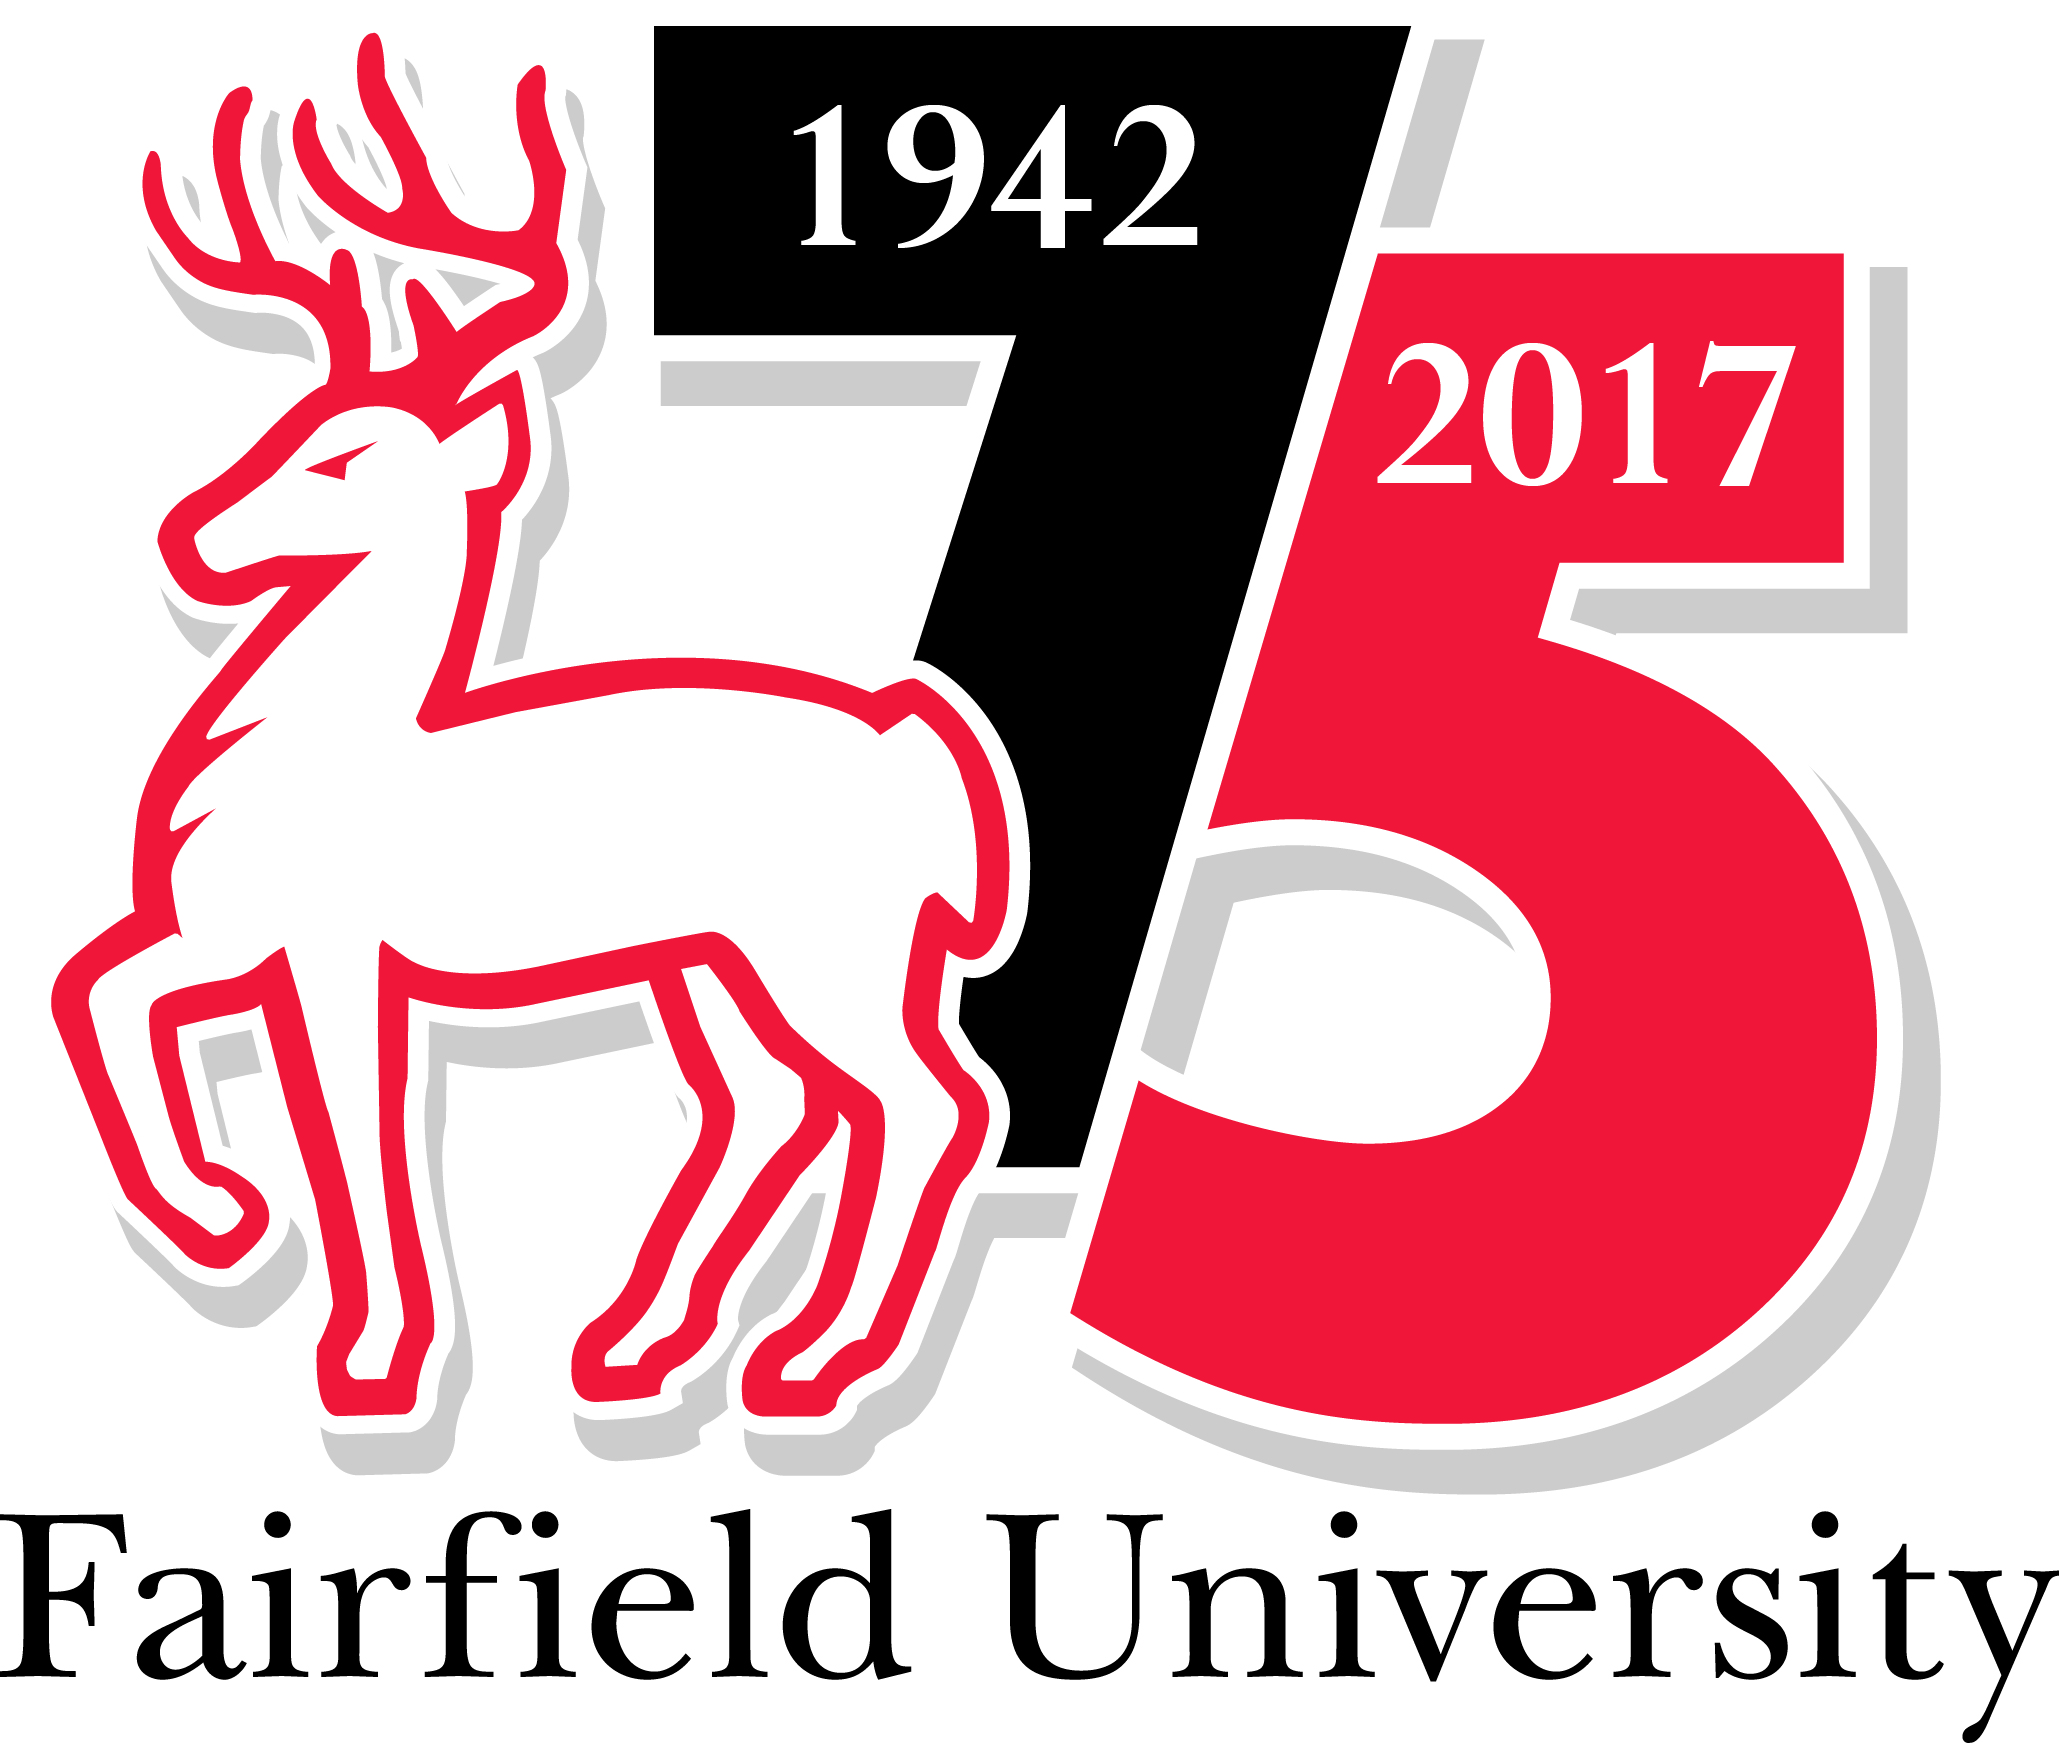 Photo by Fairfield University